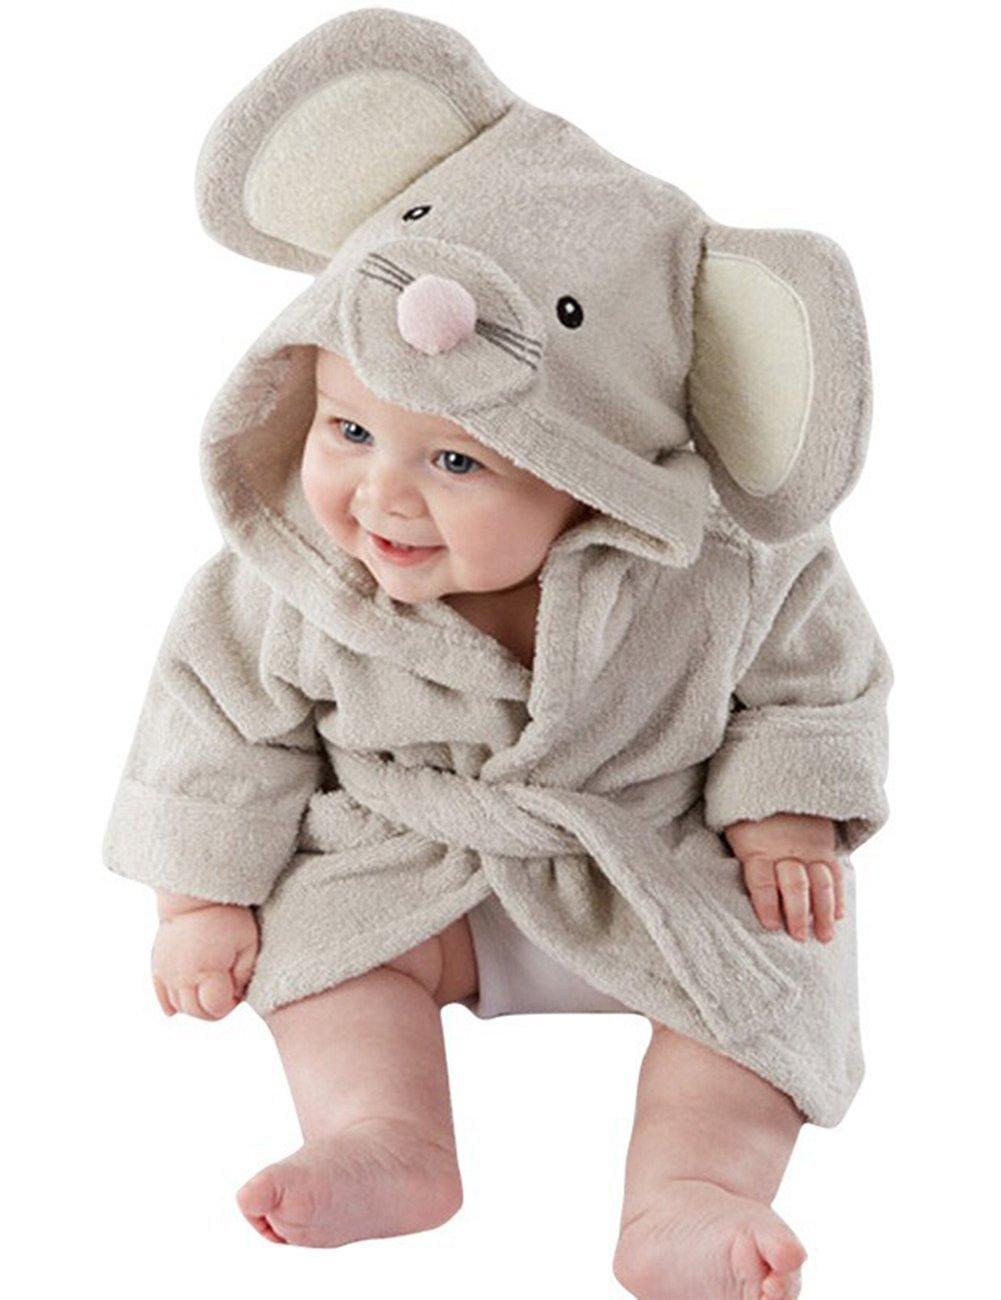 FAYALE Baby Flannel Cartoon Animal Hooded Towel Bath Robe